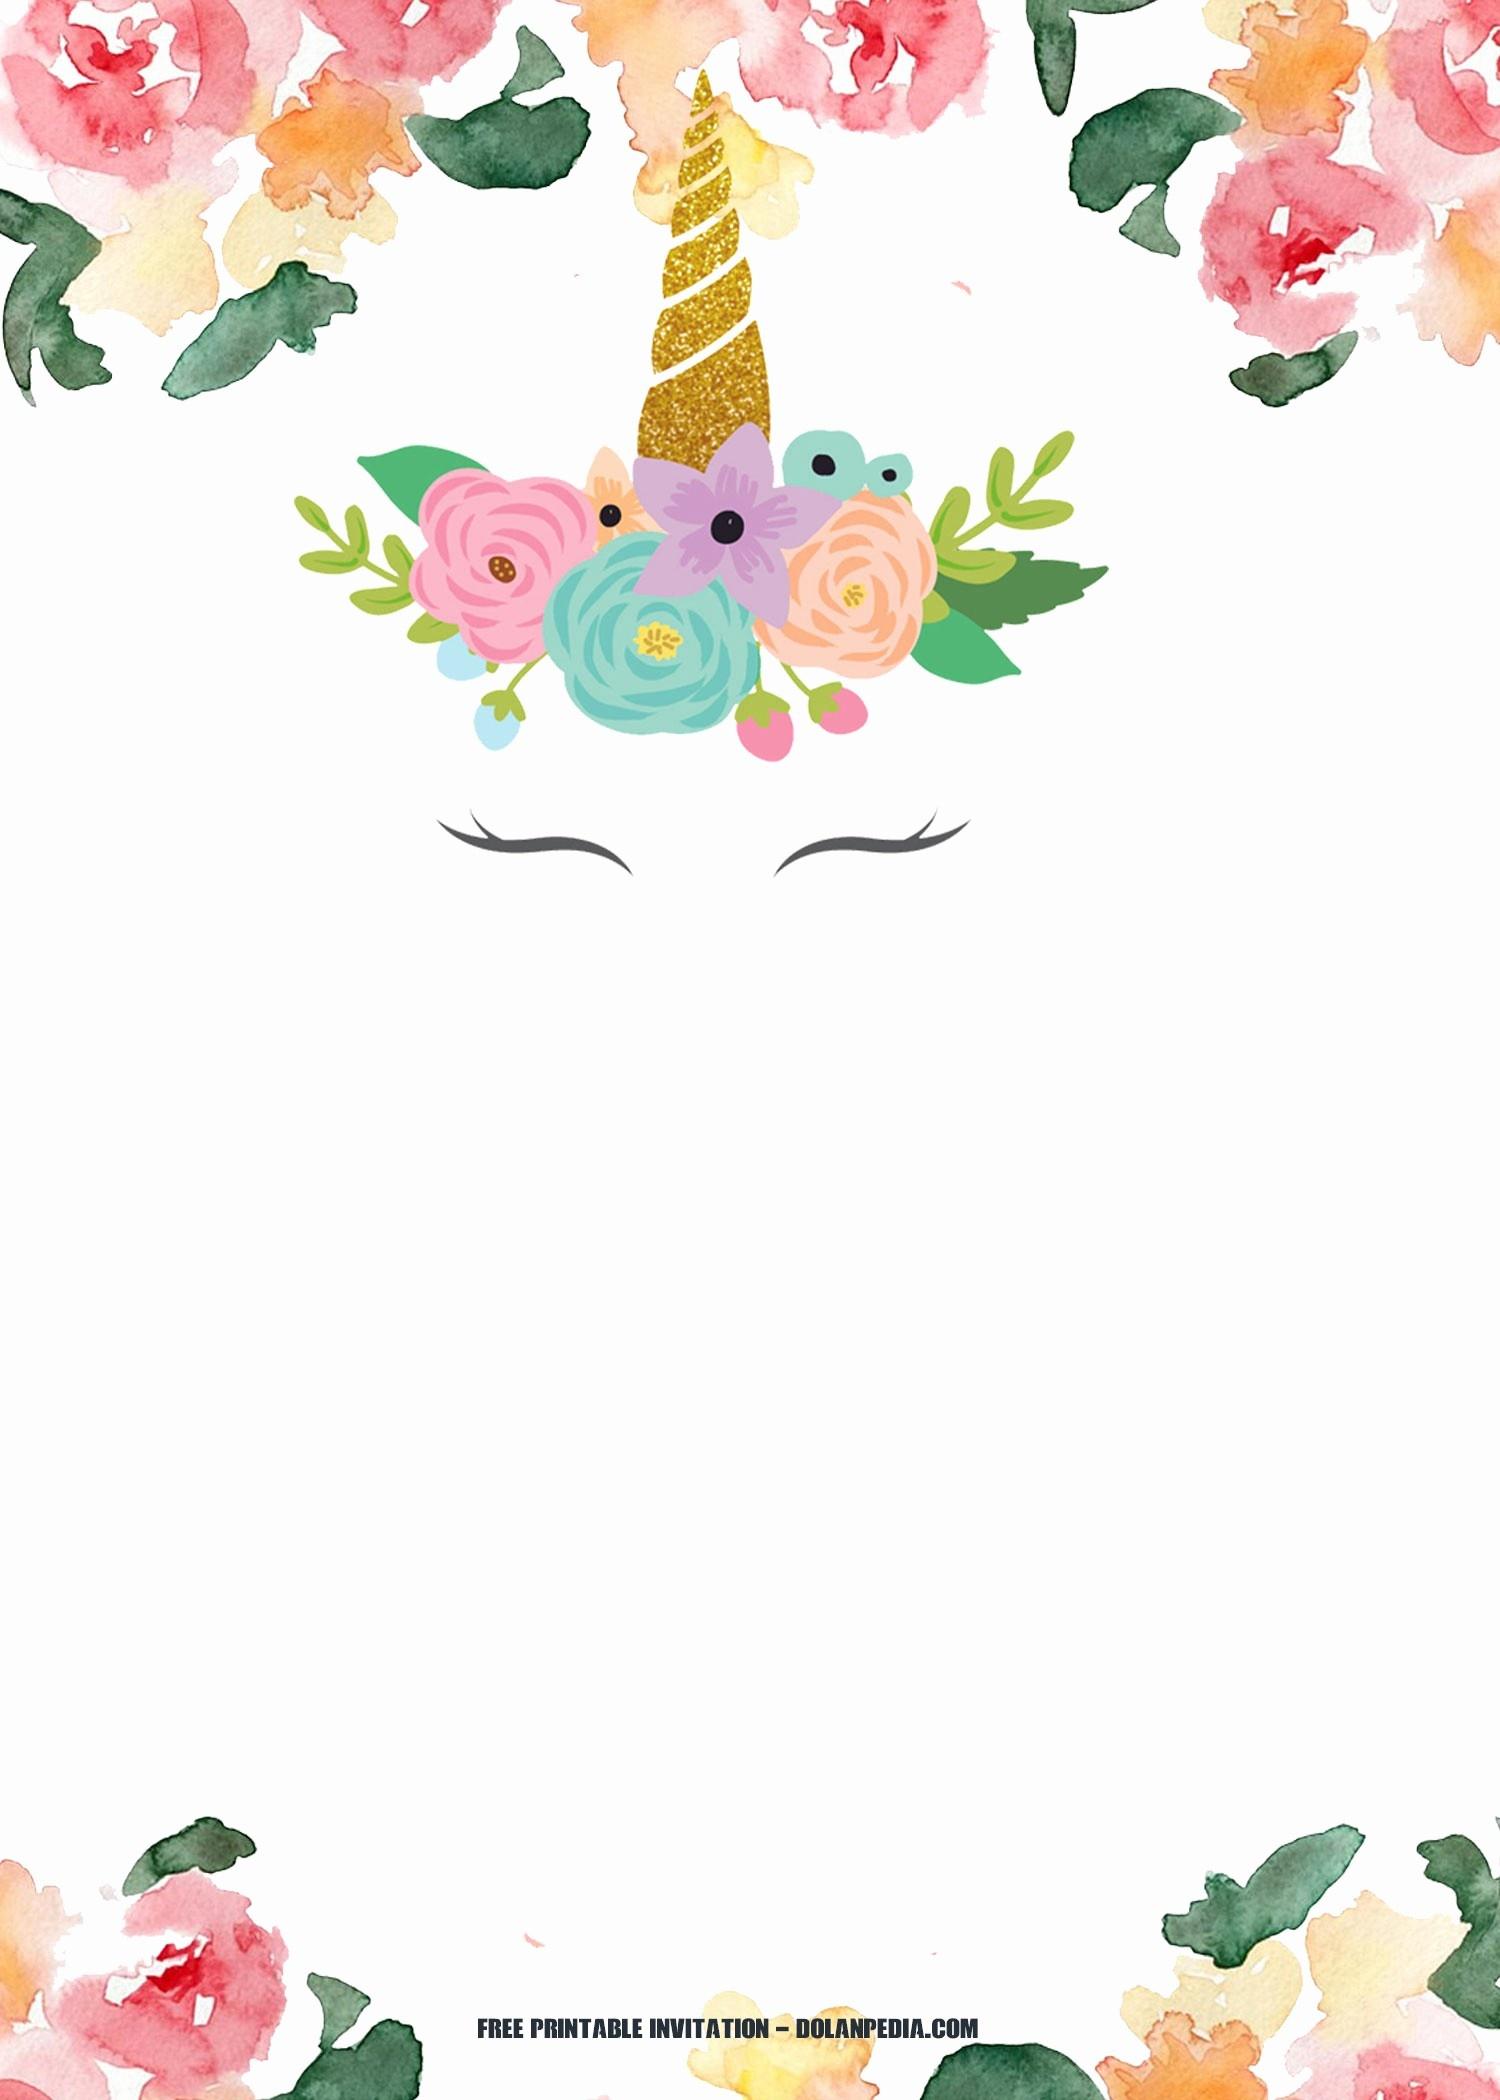 50 Free Party Invitation Templates | Culturatti - Free Printable Invitations Templates